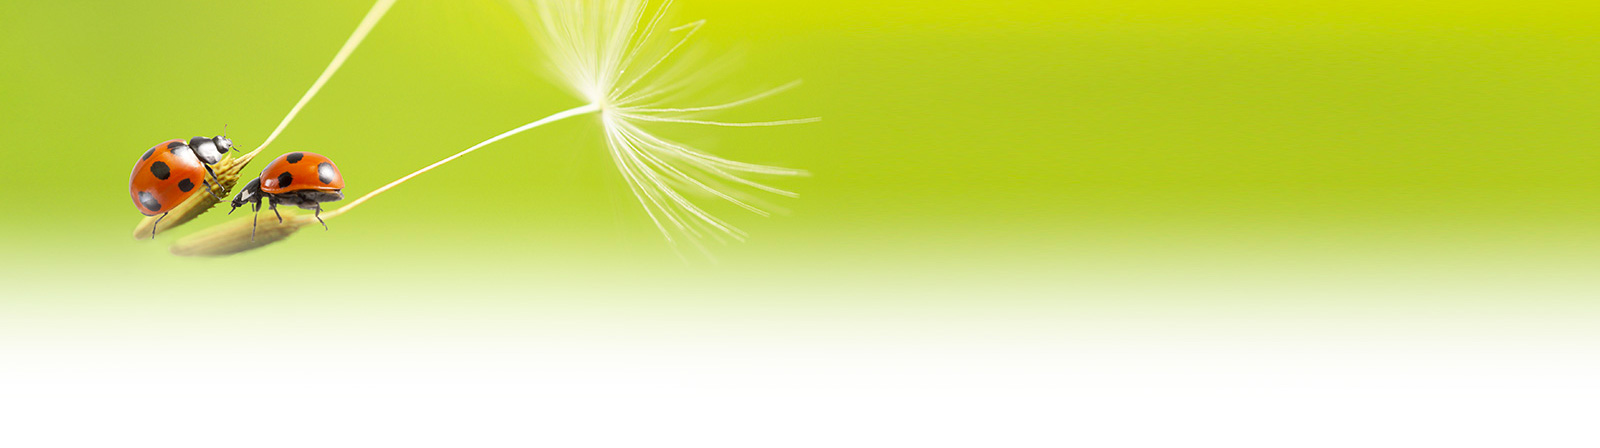 sfondo green emotion